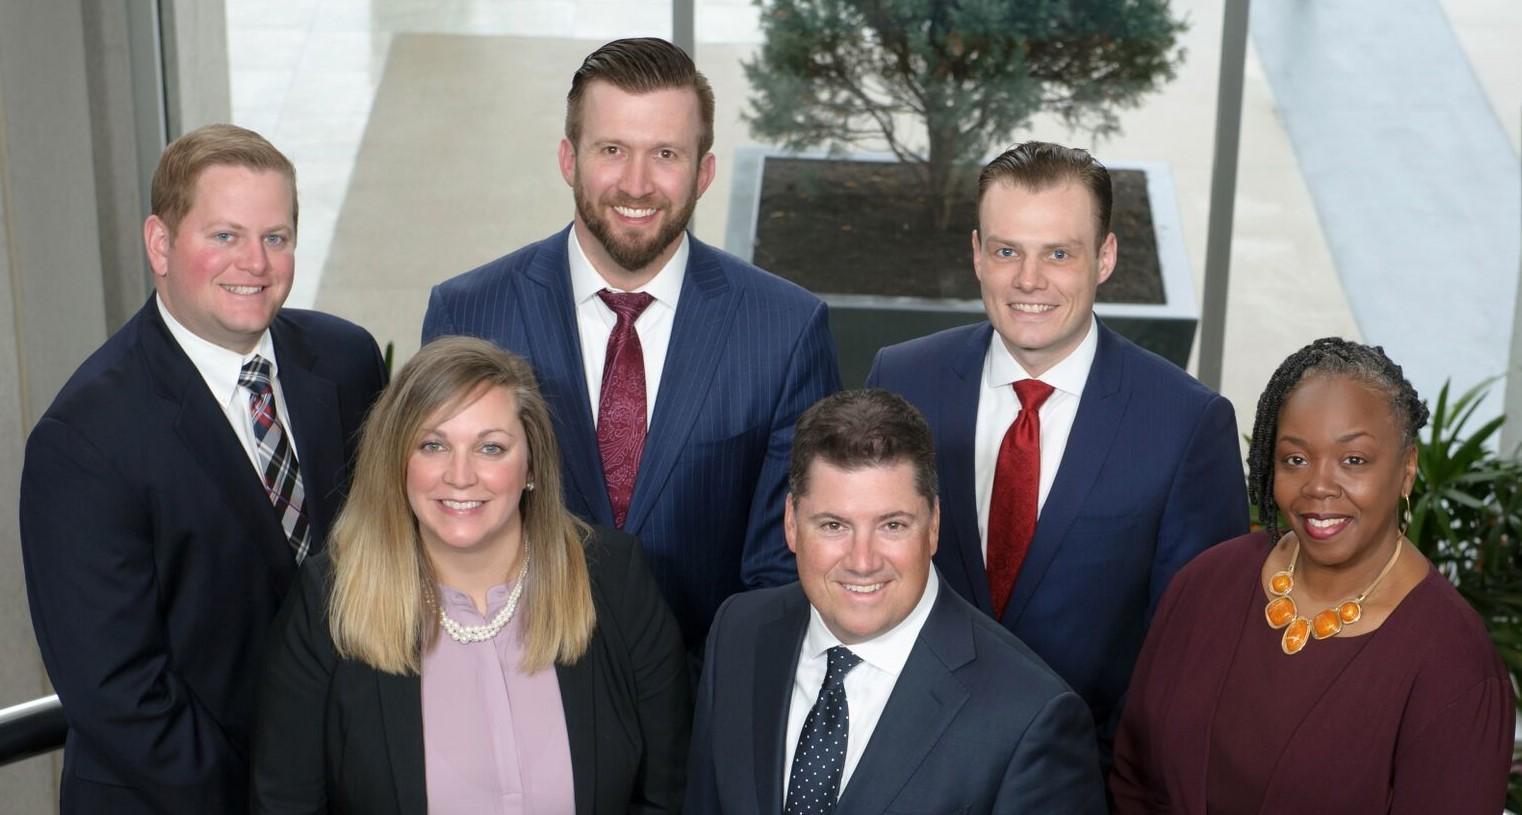 Team at Oxford Financial Partners Cincinnati, Ohio, Oxford Financial Partners